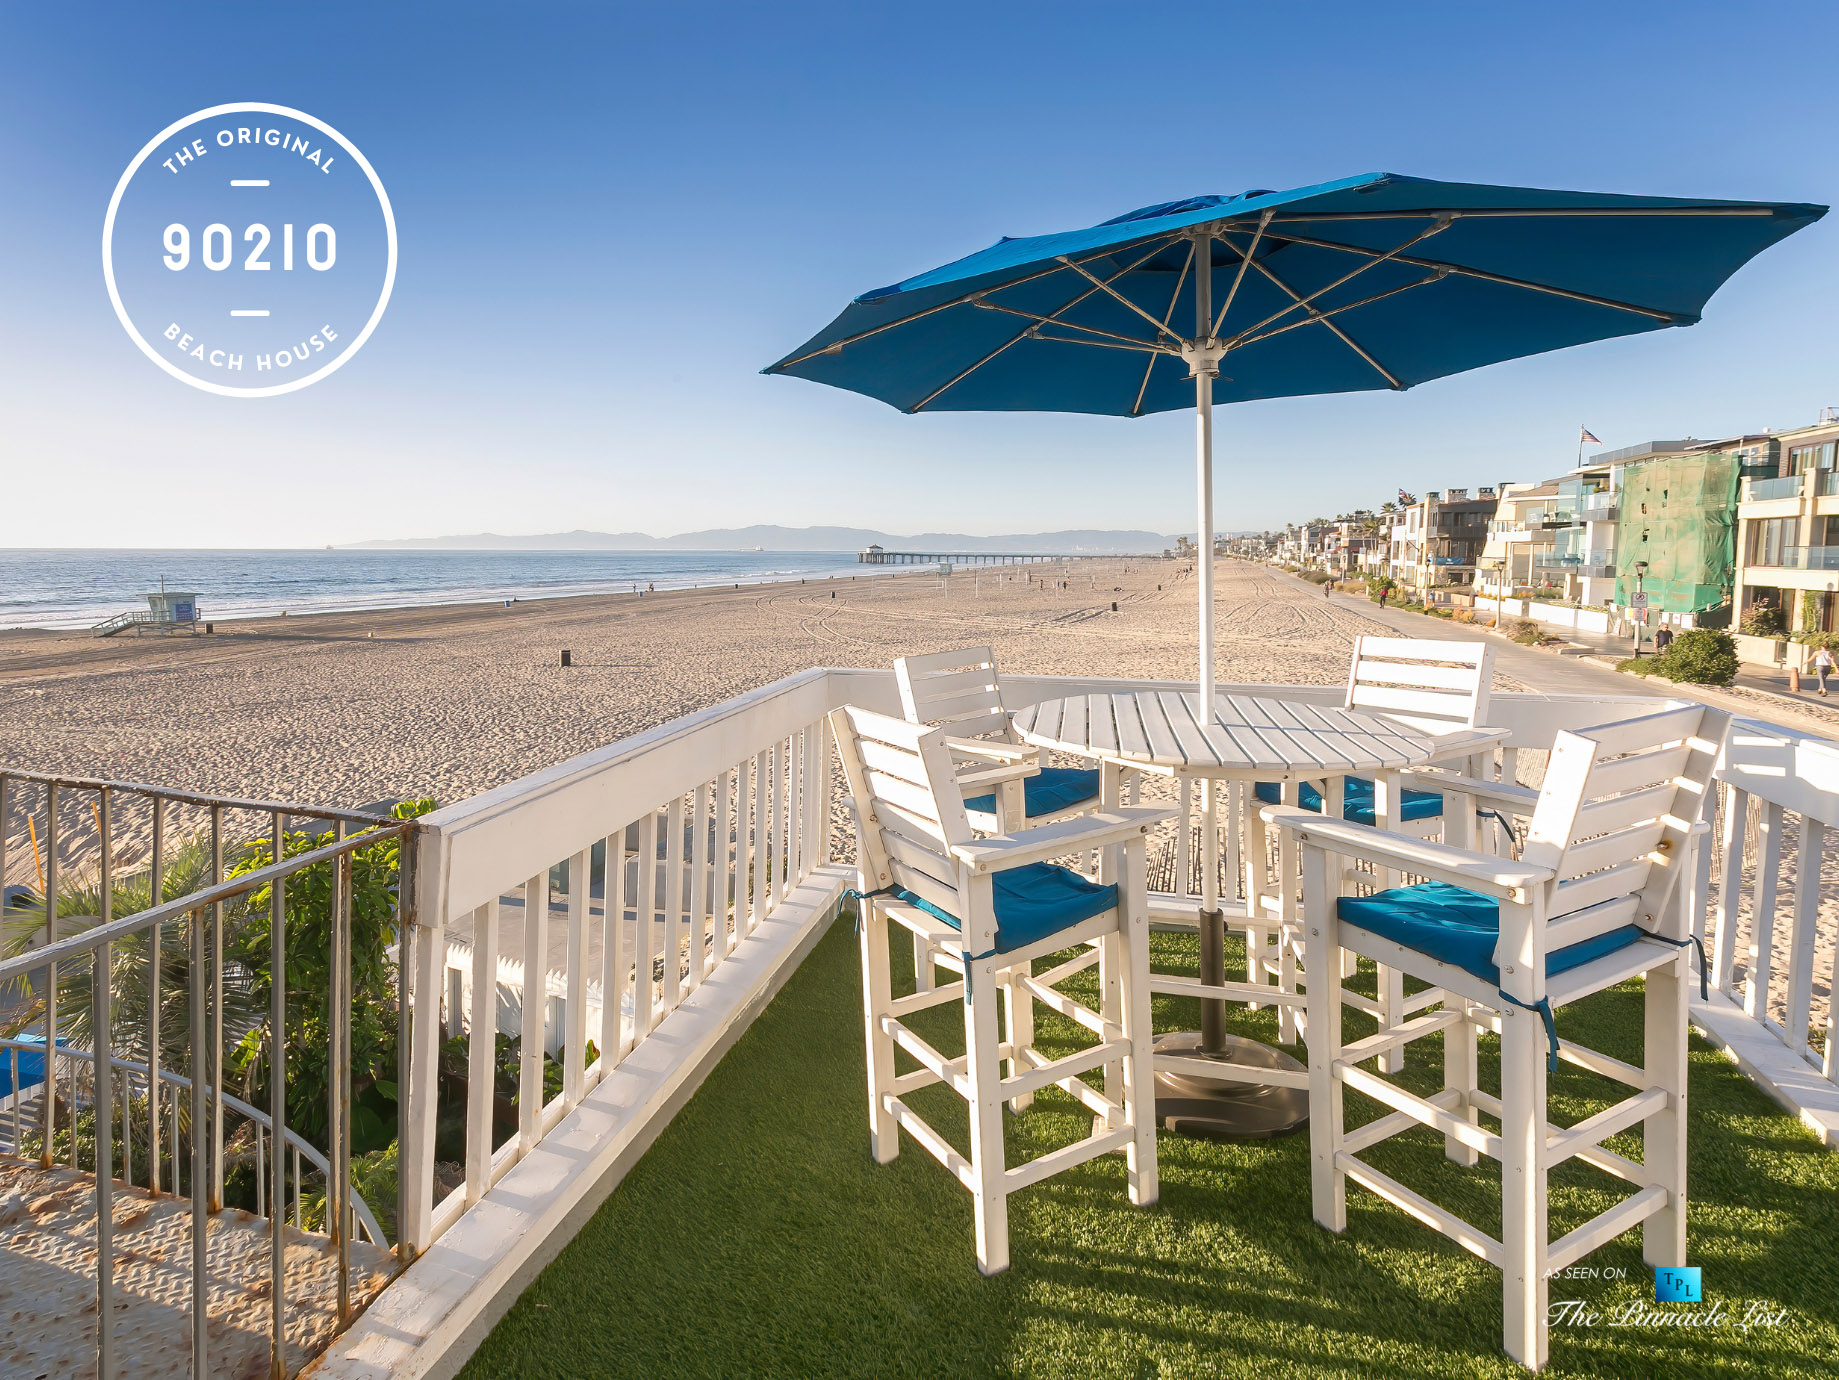 The Original 90210 Beach House – 3500 The Strand, Hermosa Beach, CA, USA – Beach View Deck